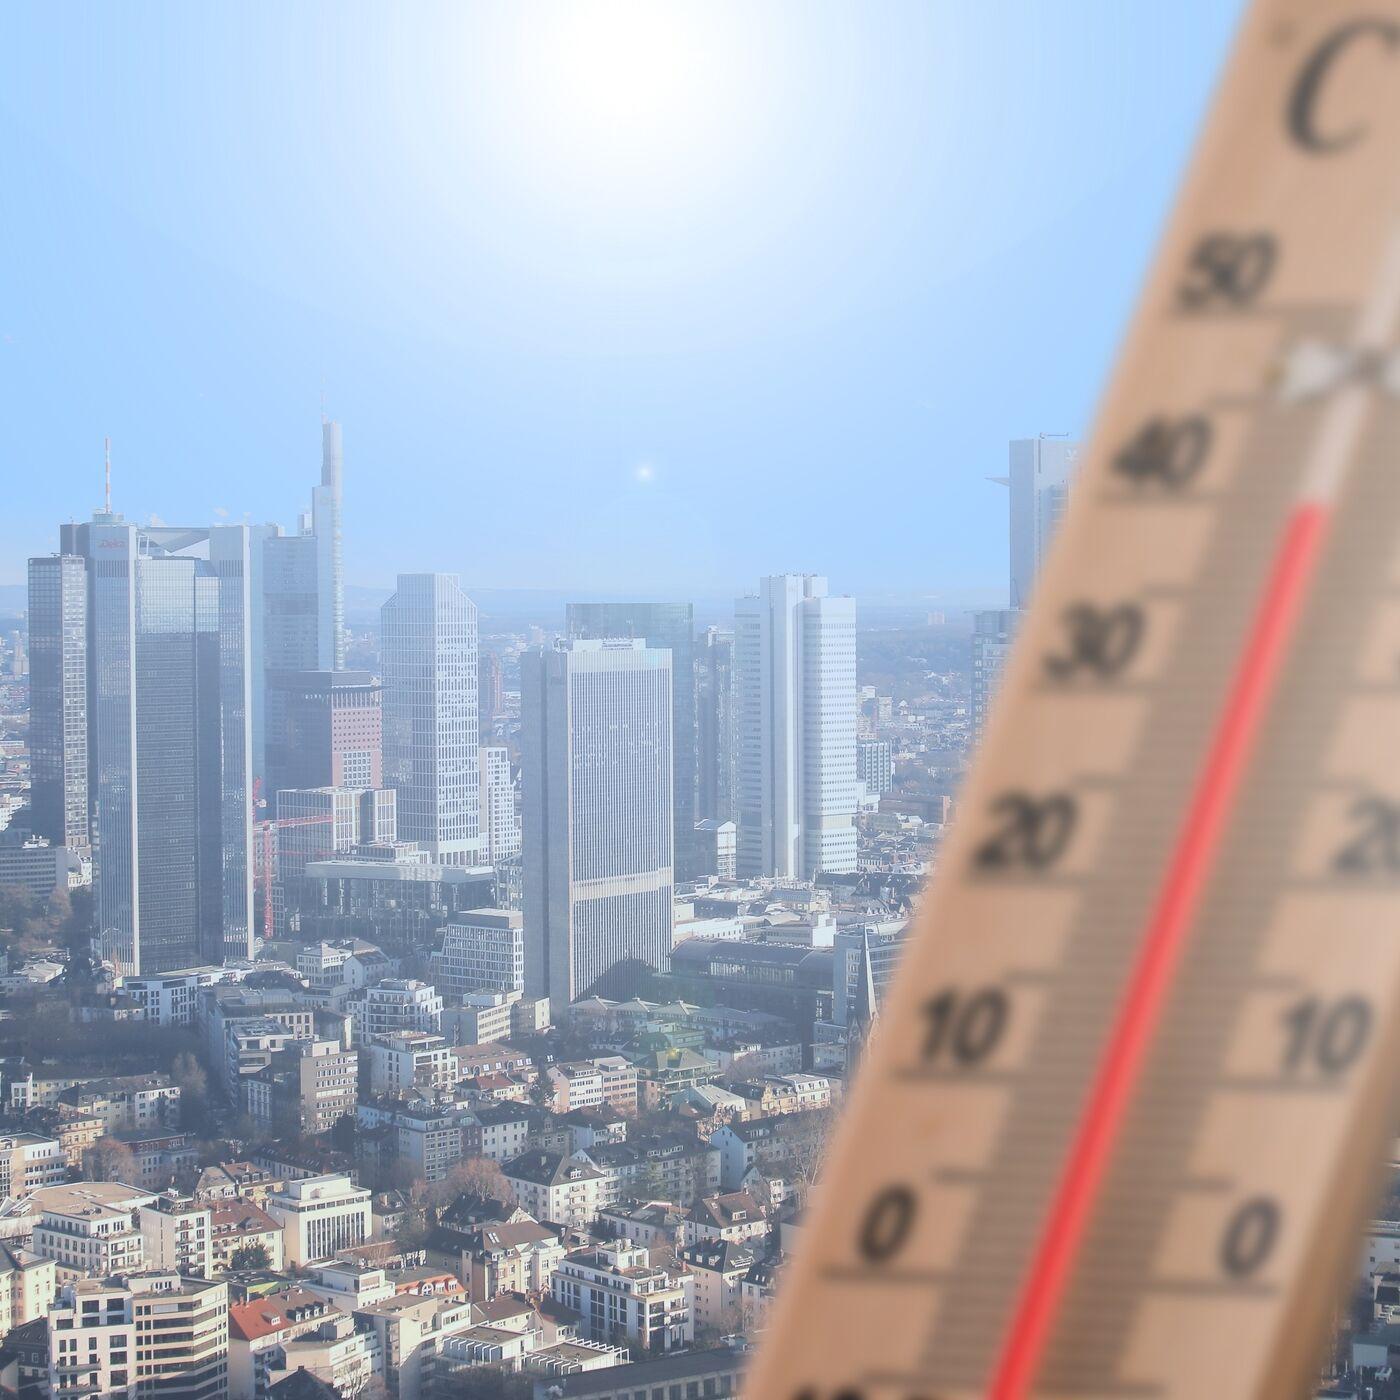 Extreme Heat & Urban Planning